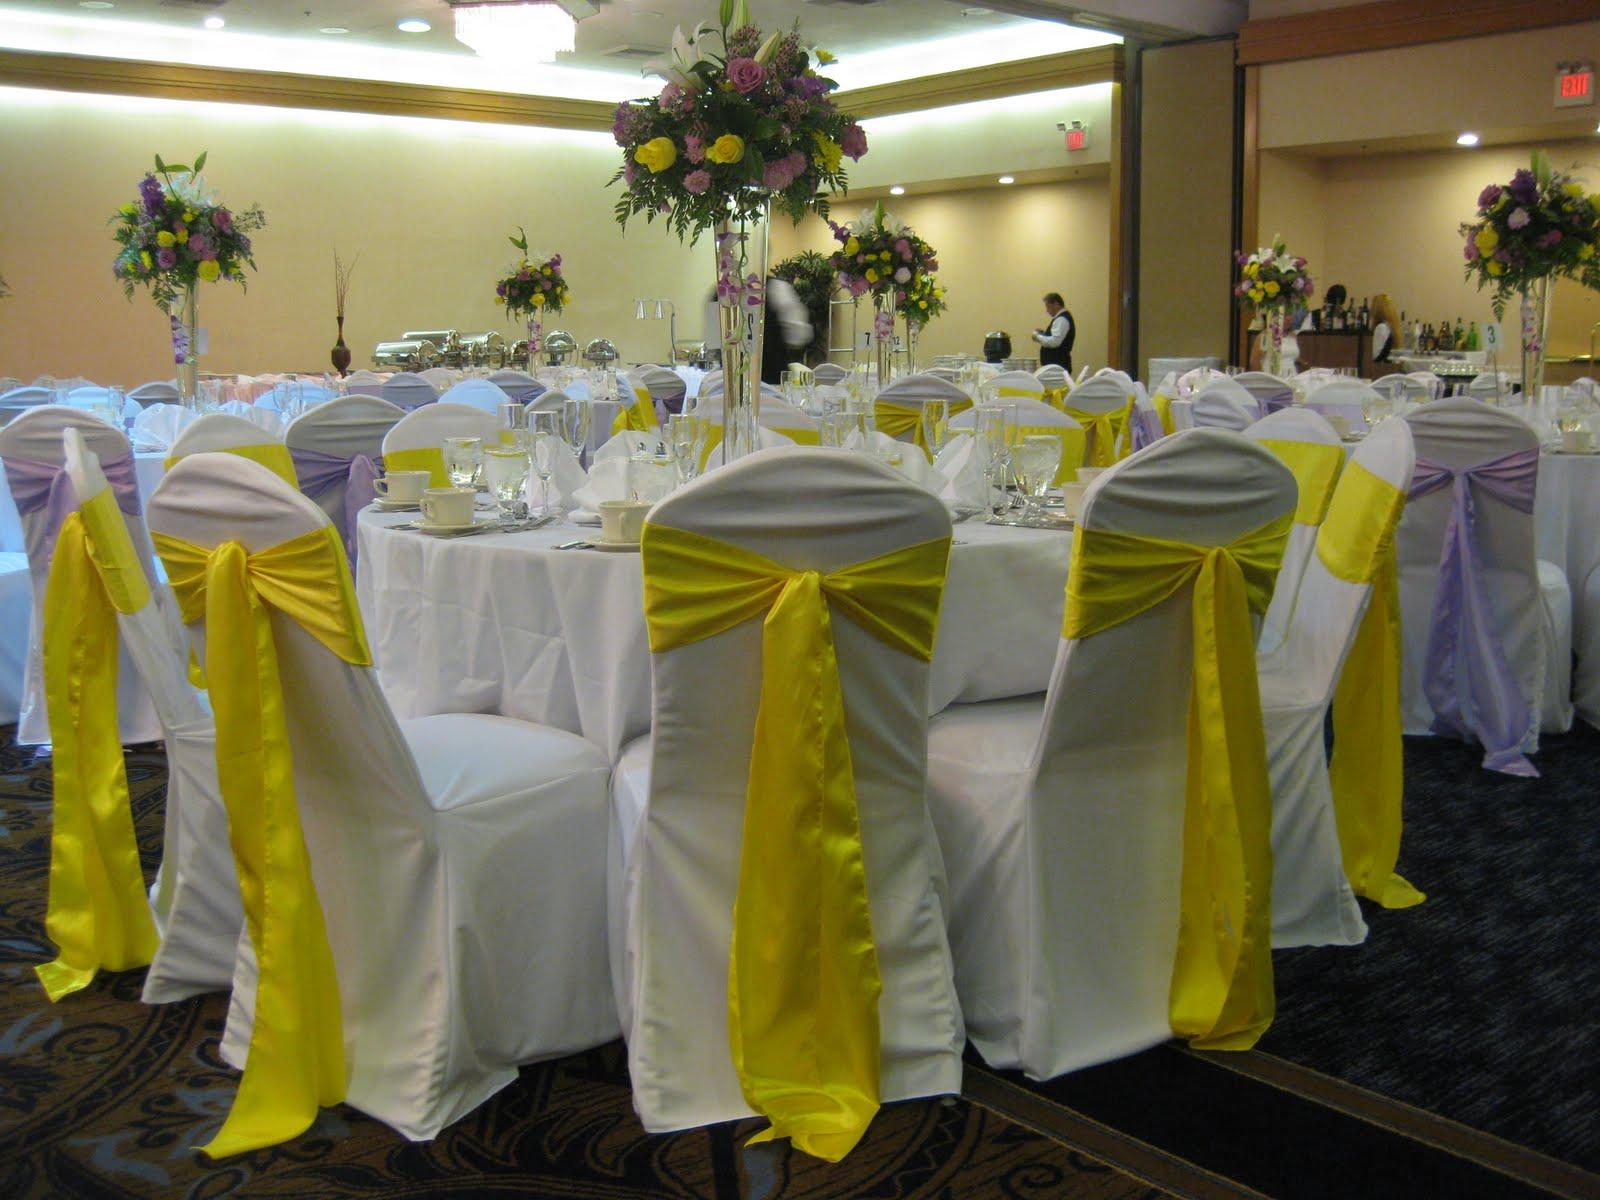 Orange County Wedding Chair Covers Rental Sash Colors